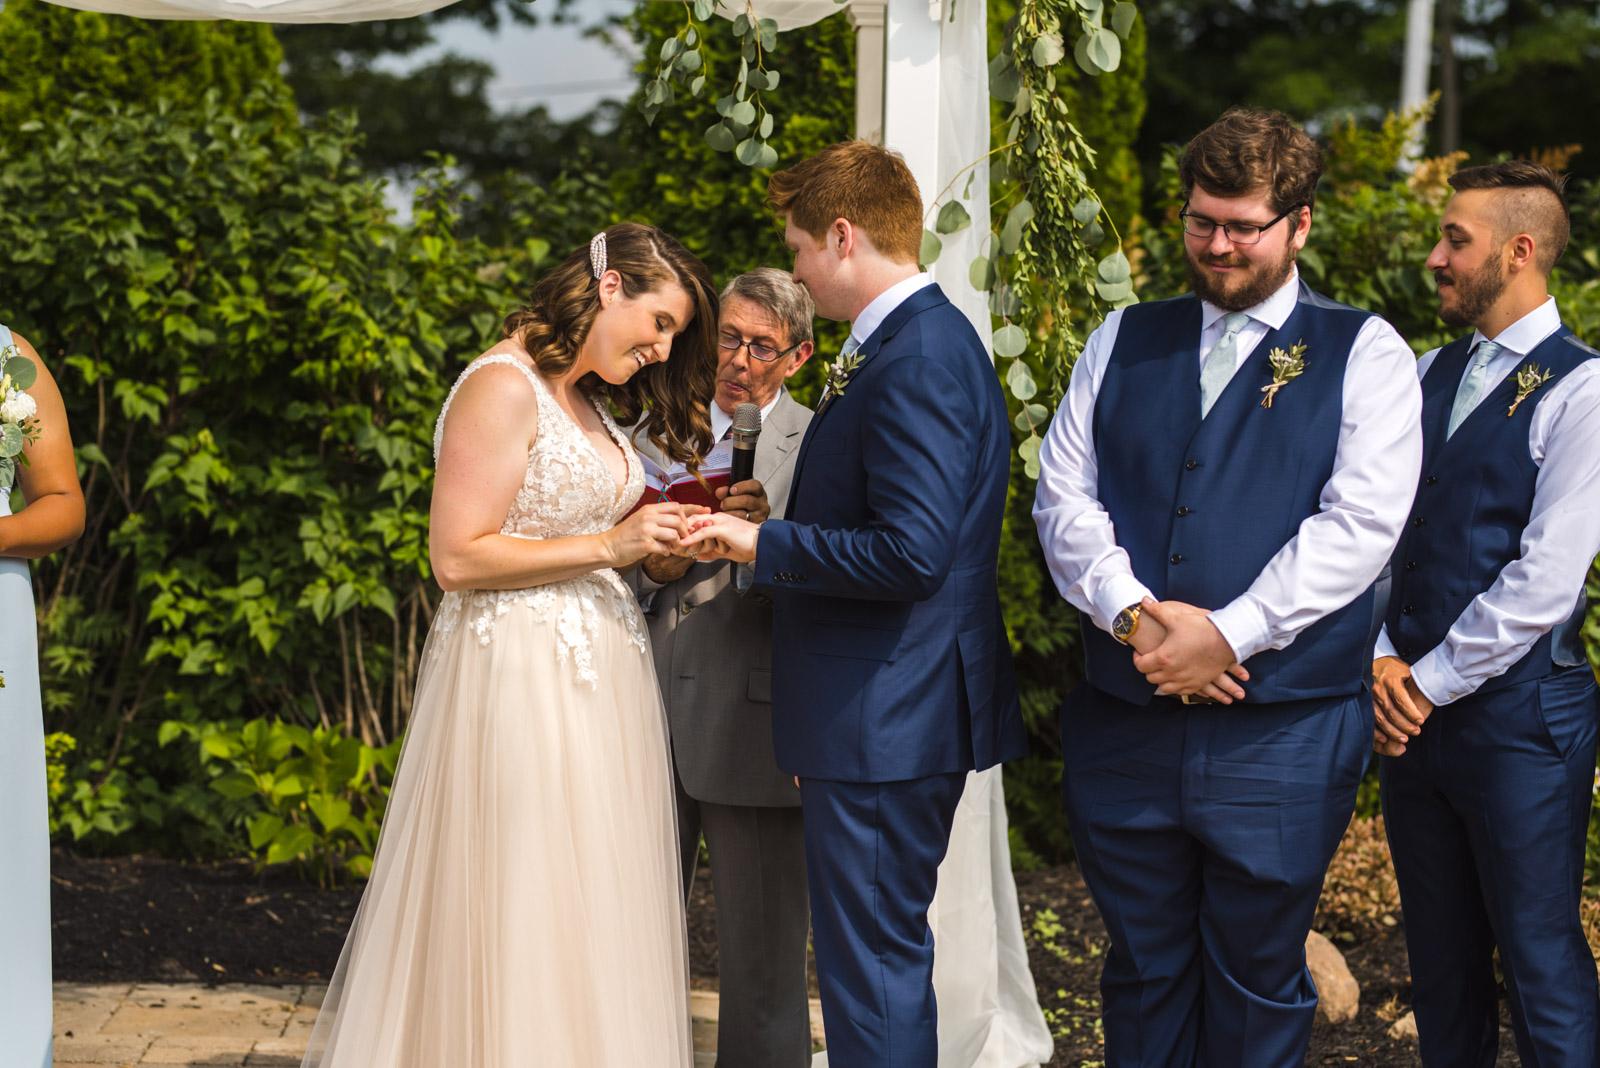 Emerson & Elicia's Golf Course Wedding Aidan & Leanne Hennebry Hamilton Wedding Videographers Photographers Niagara Hush Hush Photography & Film-23.jpg